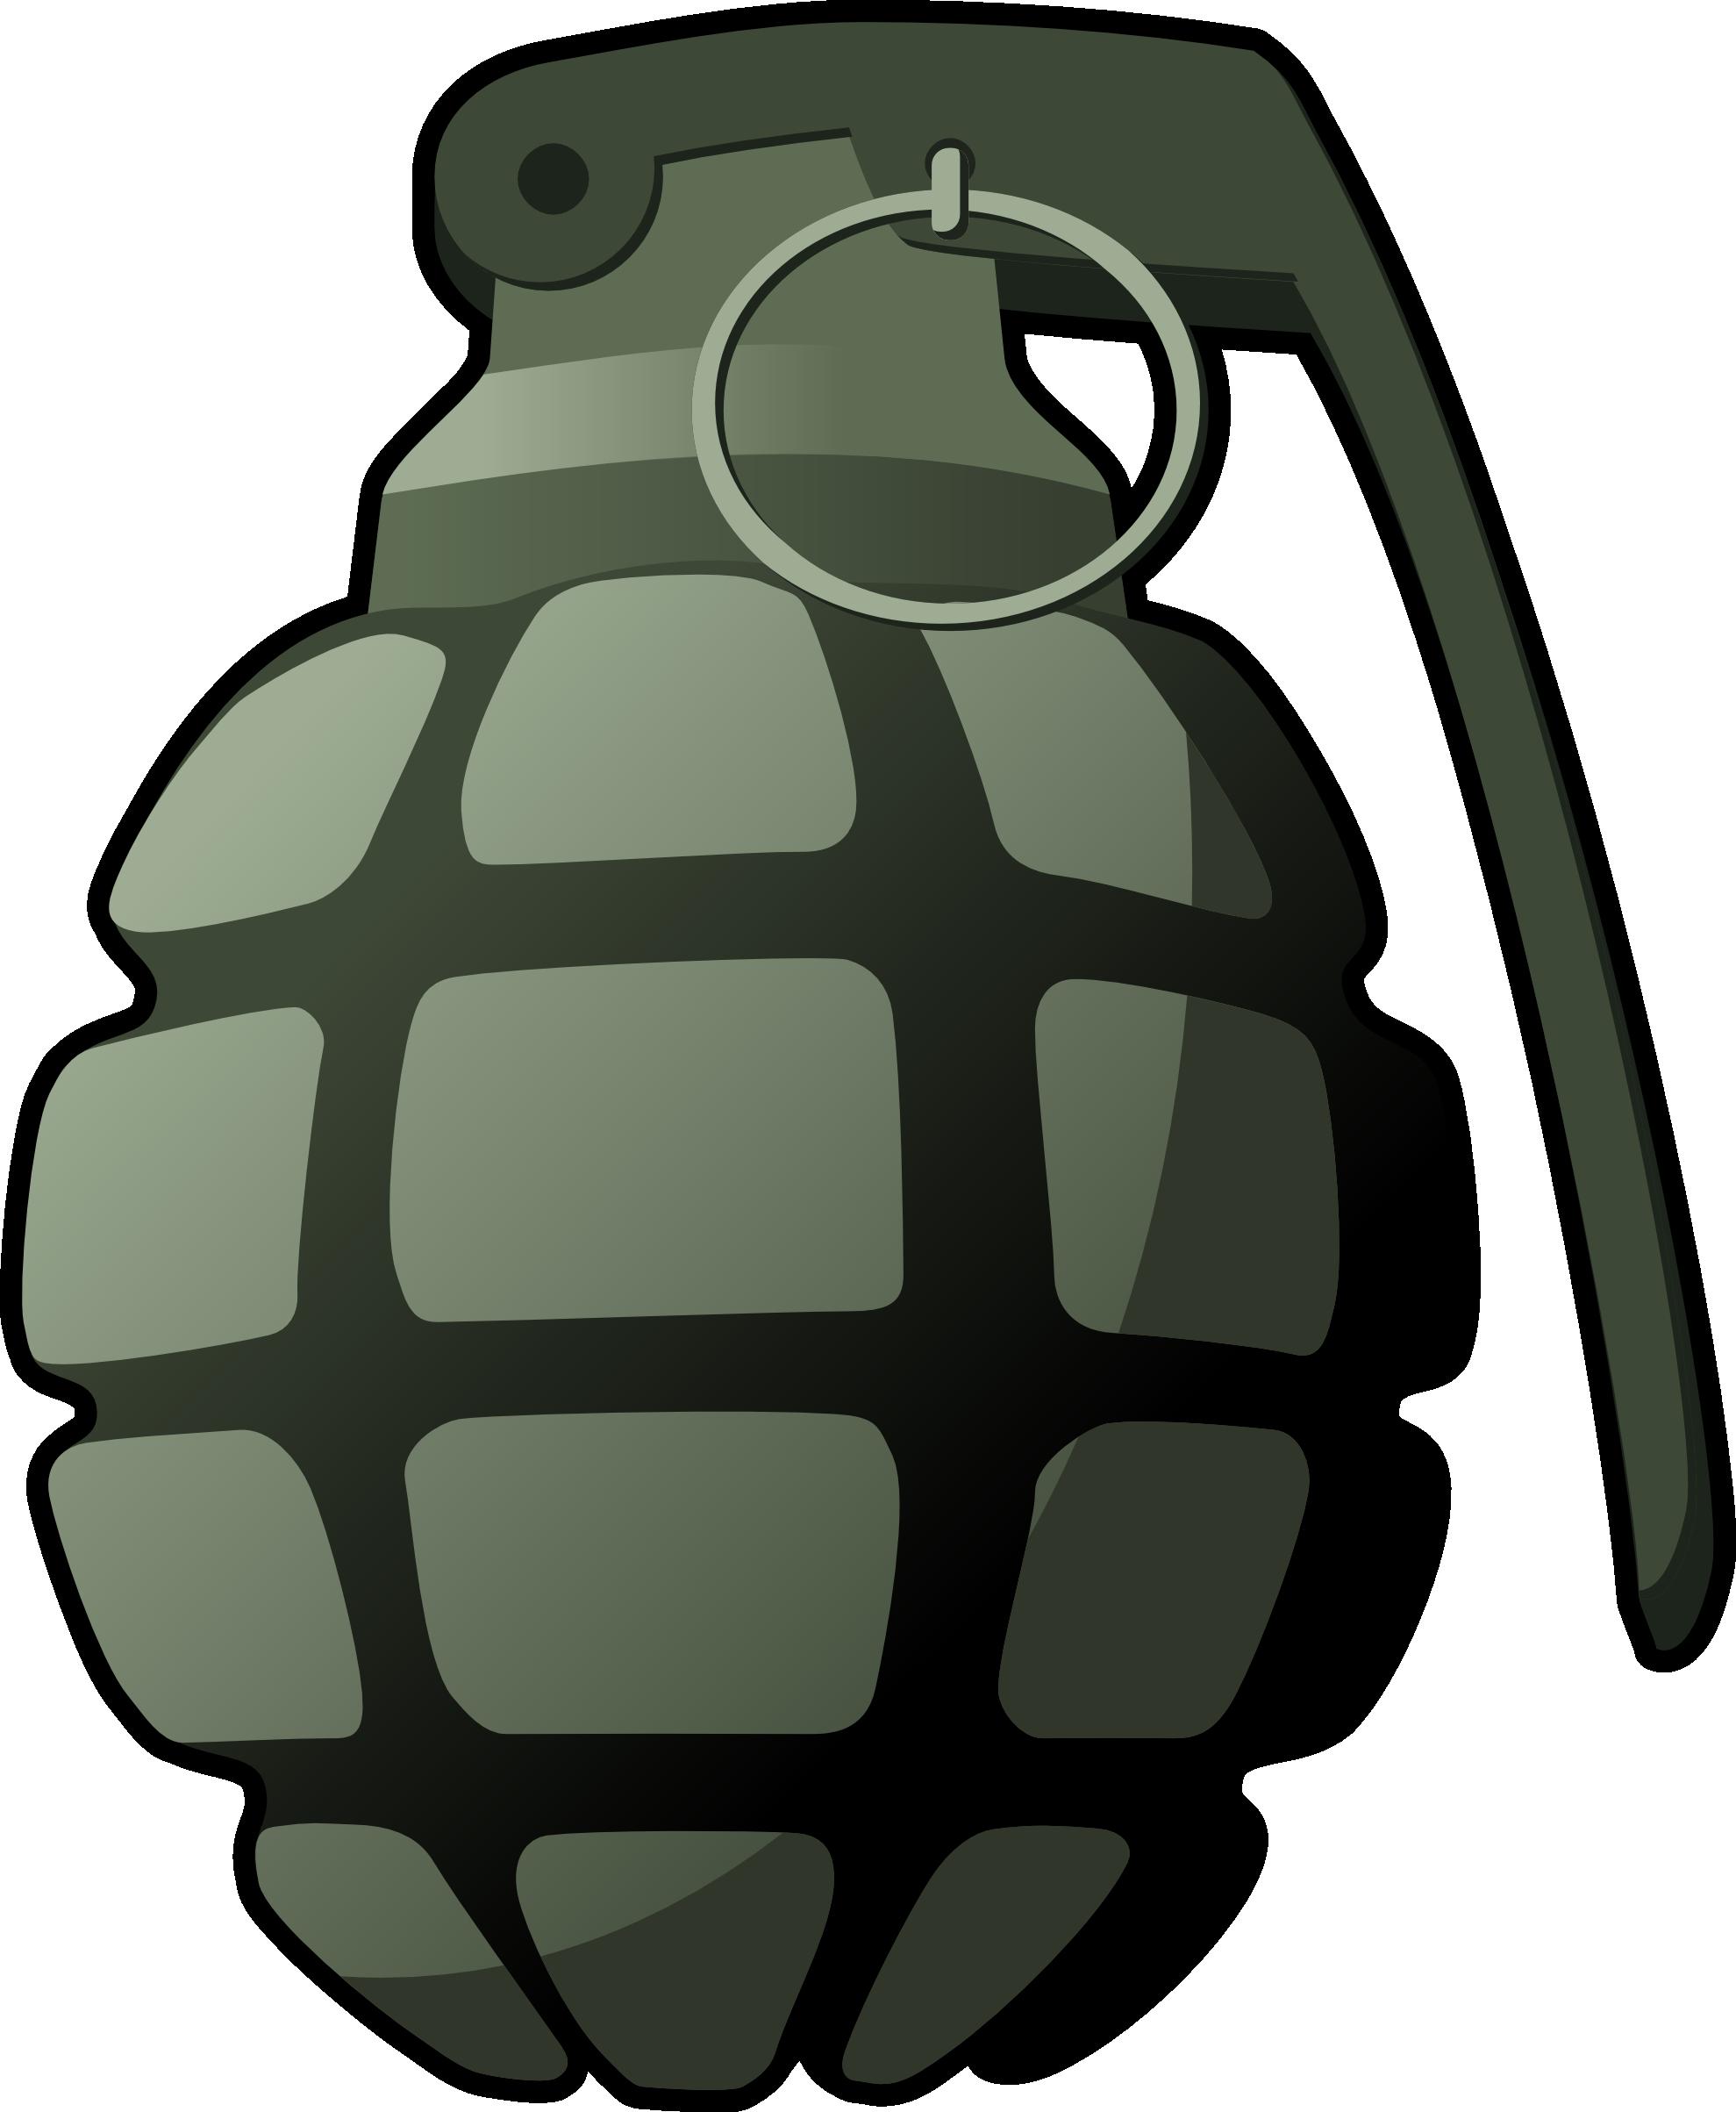 Hand Grenade Clipart.